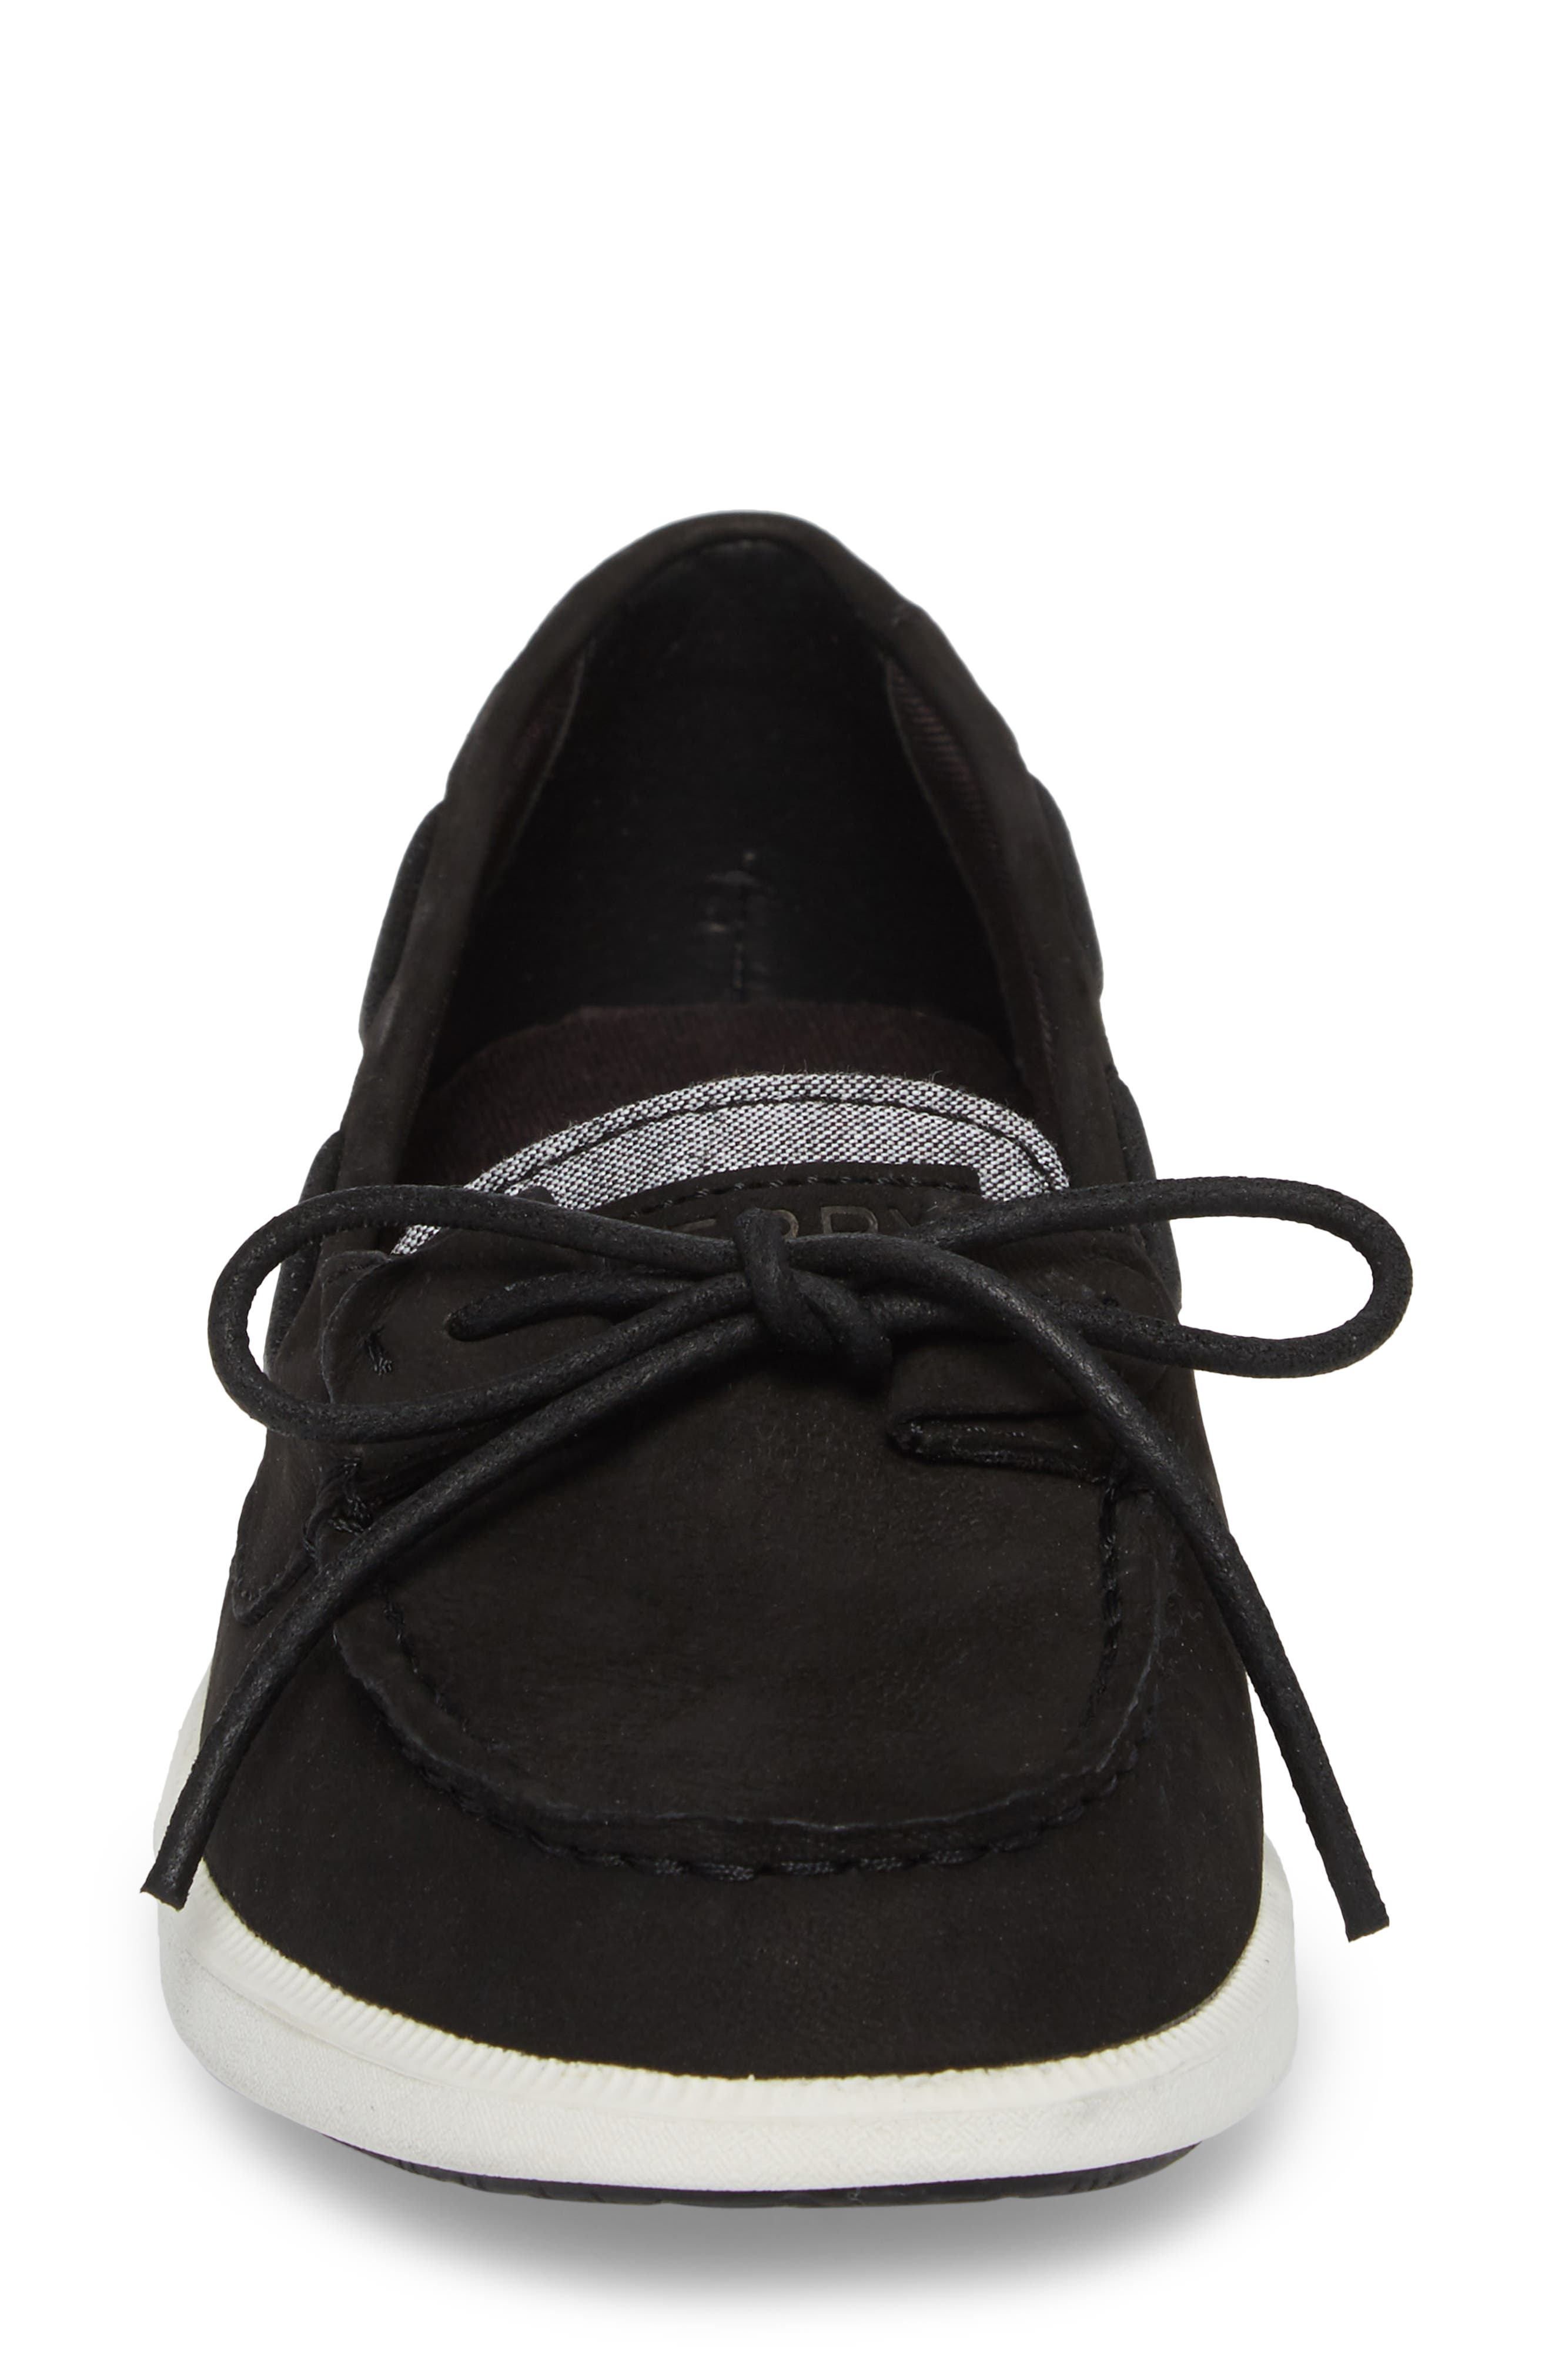 Oasis Boat Shoe,                             Alternate thumbnail 4, color,                             001